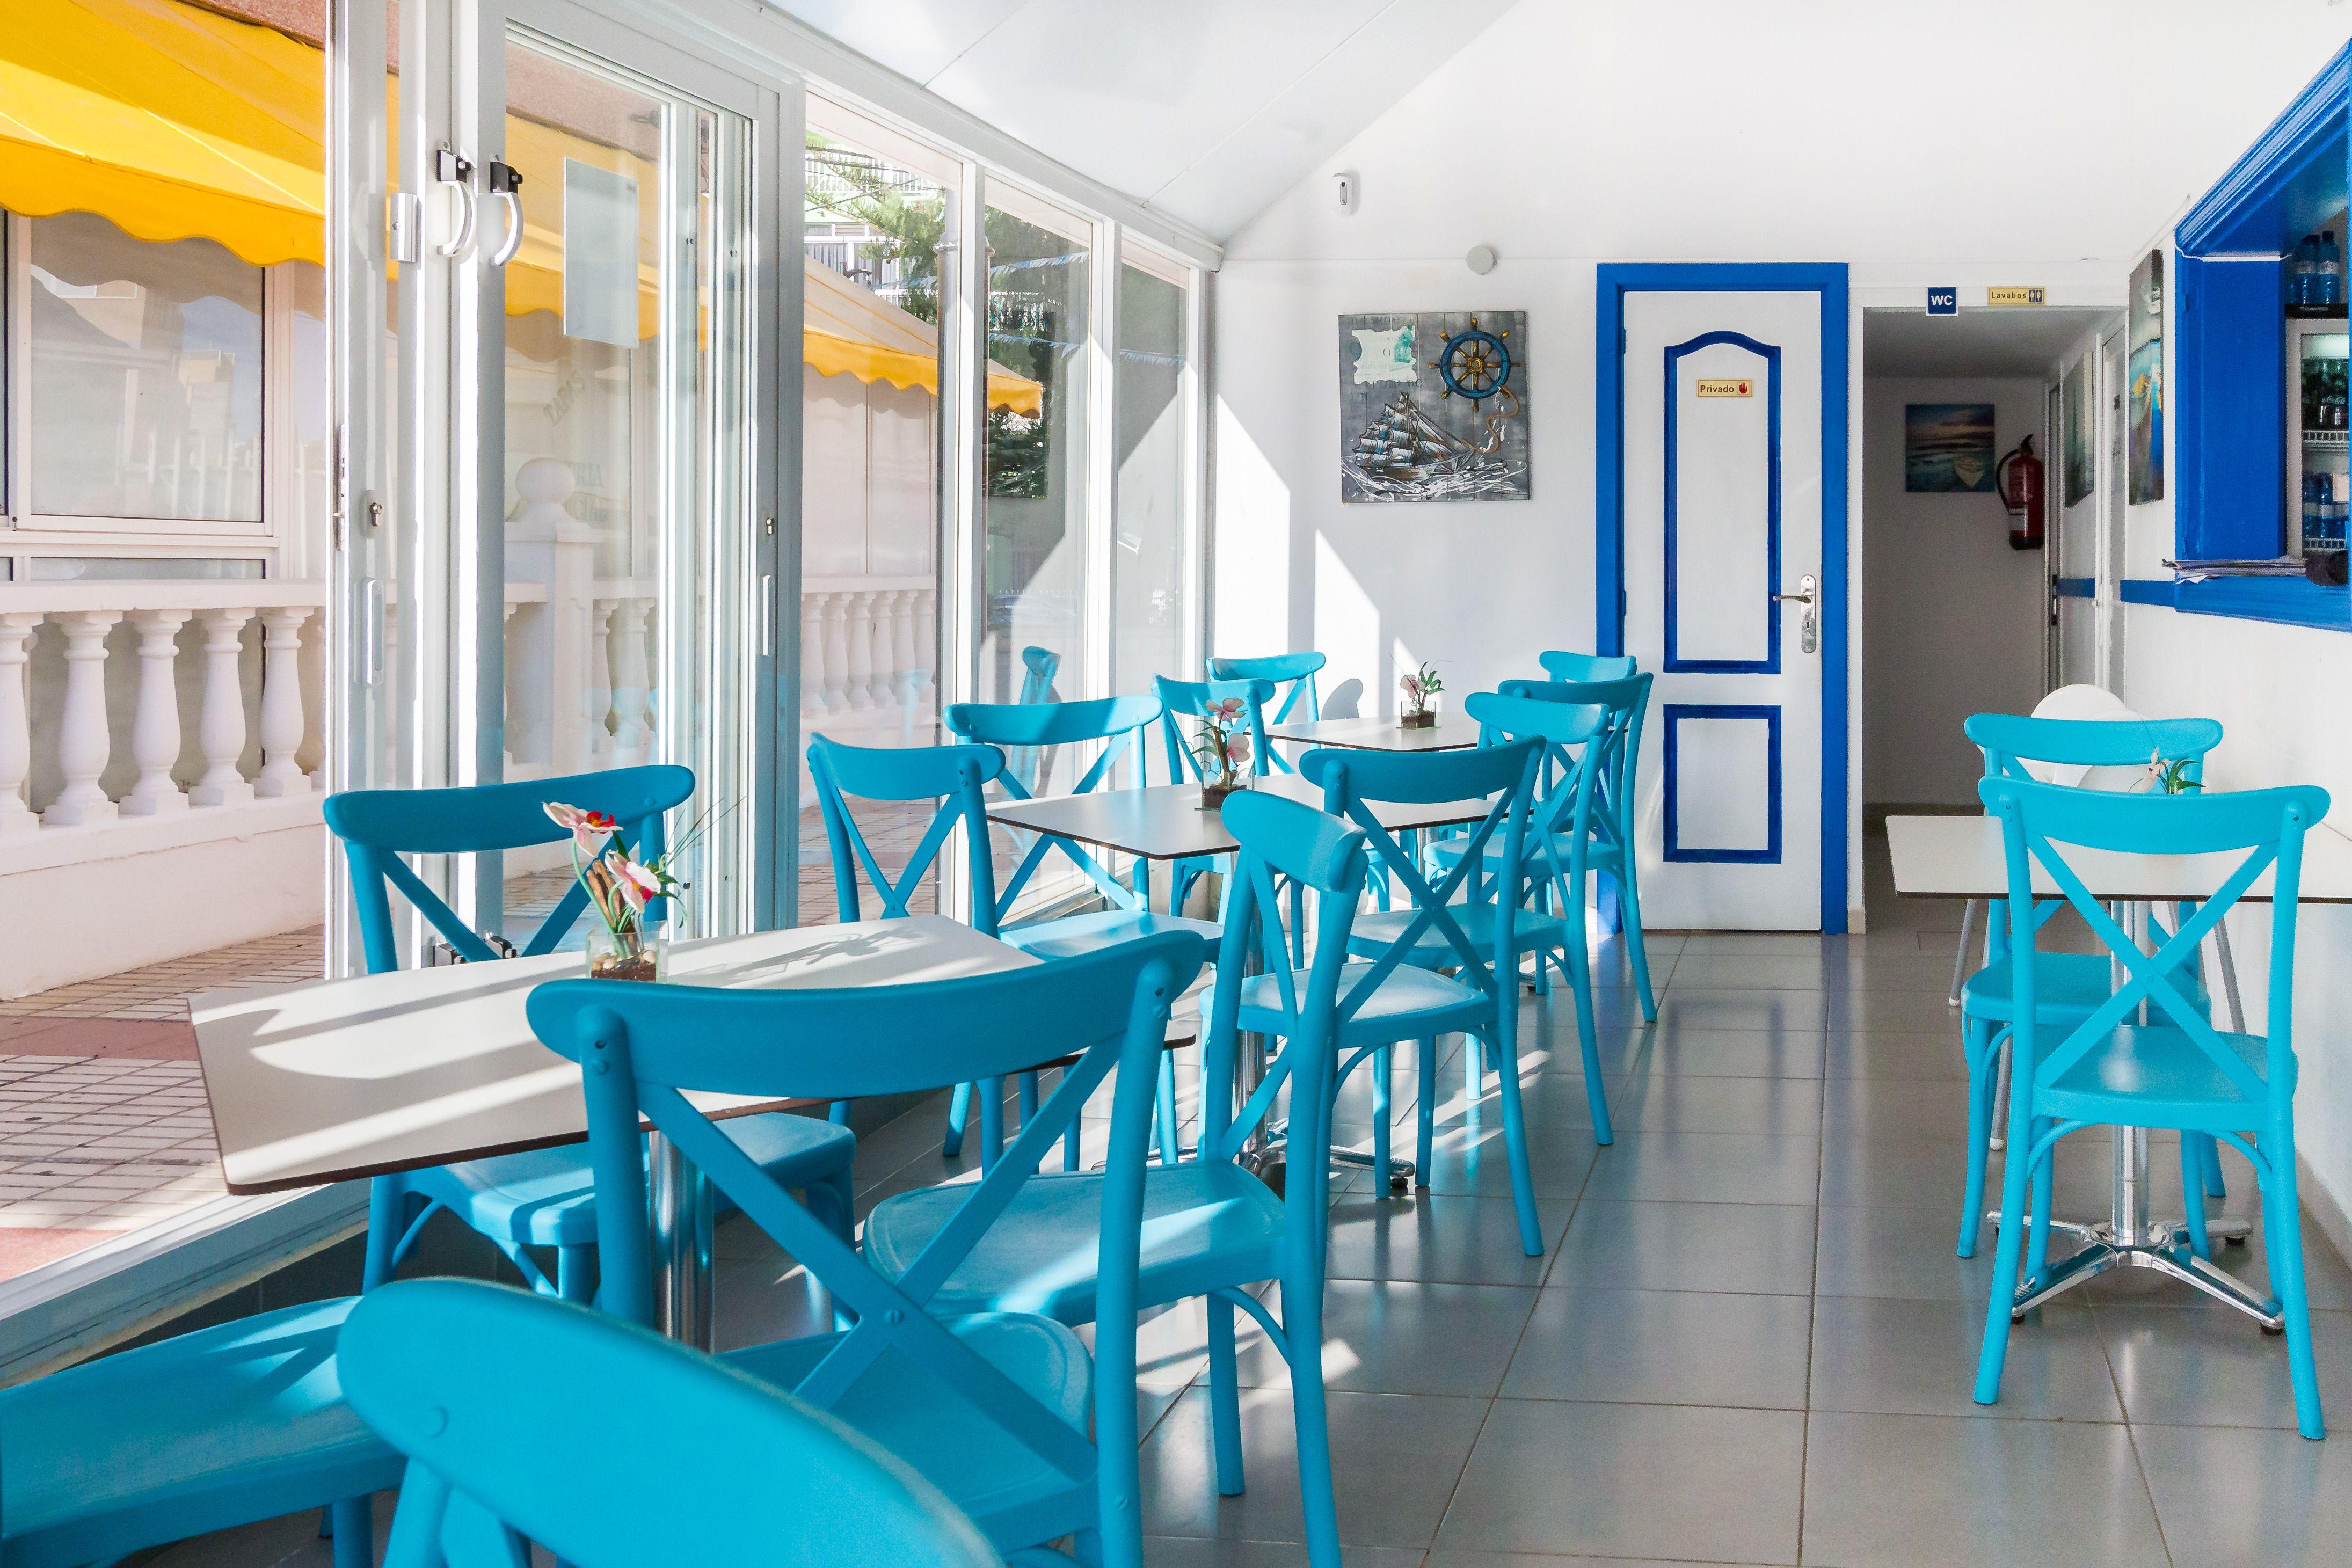 Foto 1 de Sea food restaurants en Arona | Romoletto's Restaurant